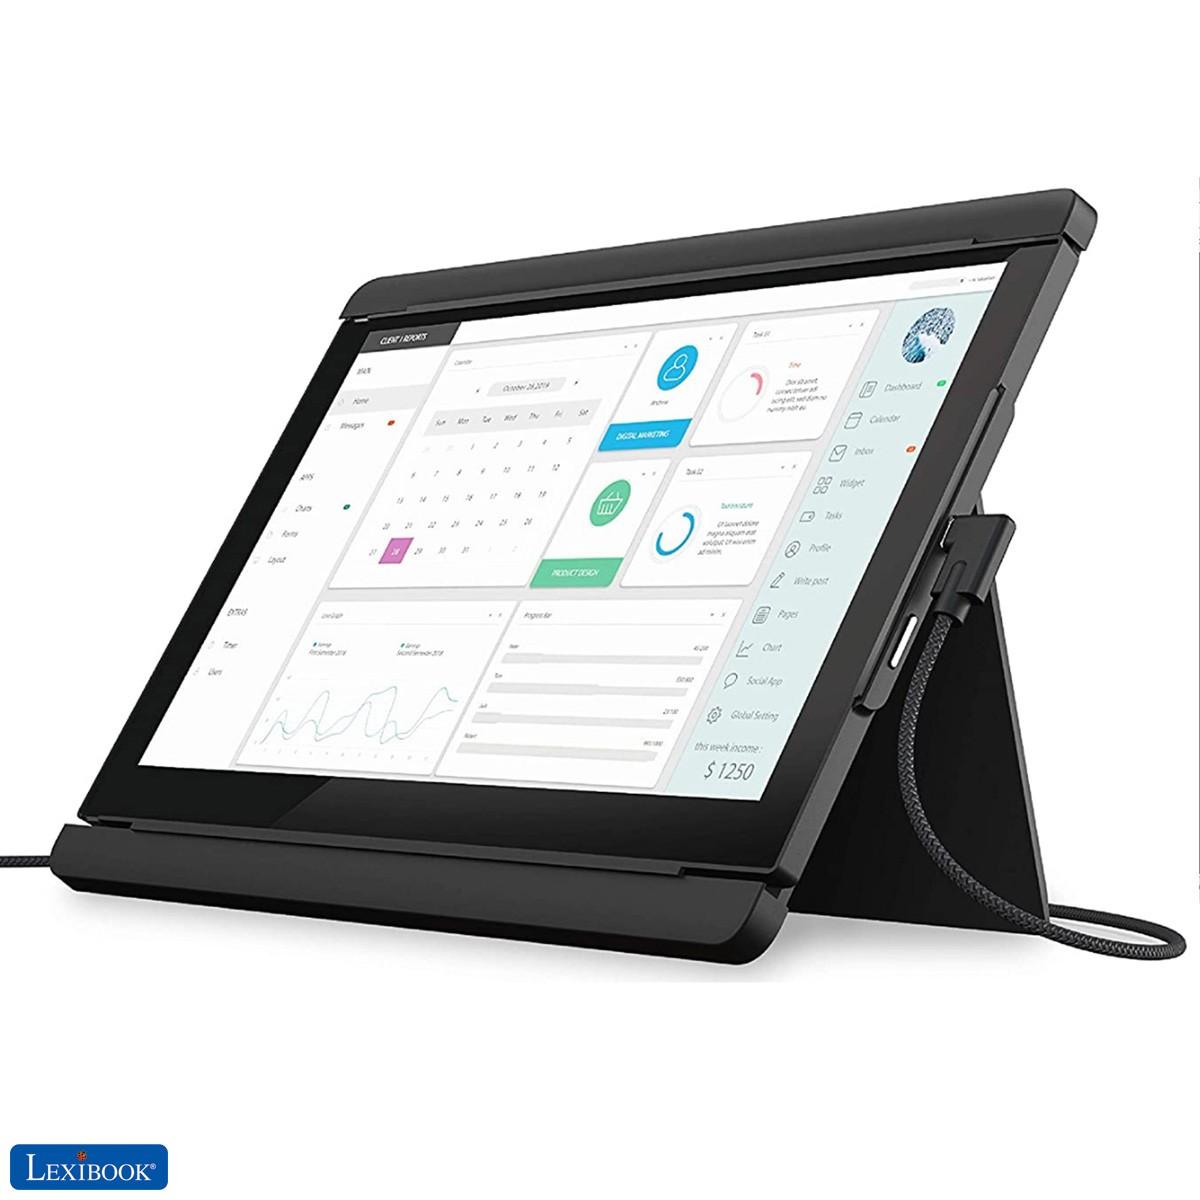 Soporte para monitor TRIO / TRIOMAX para computadora